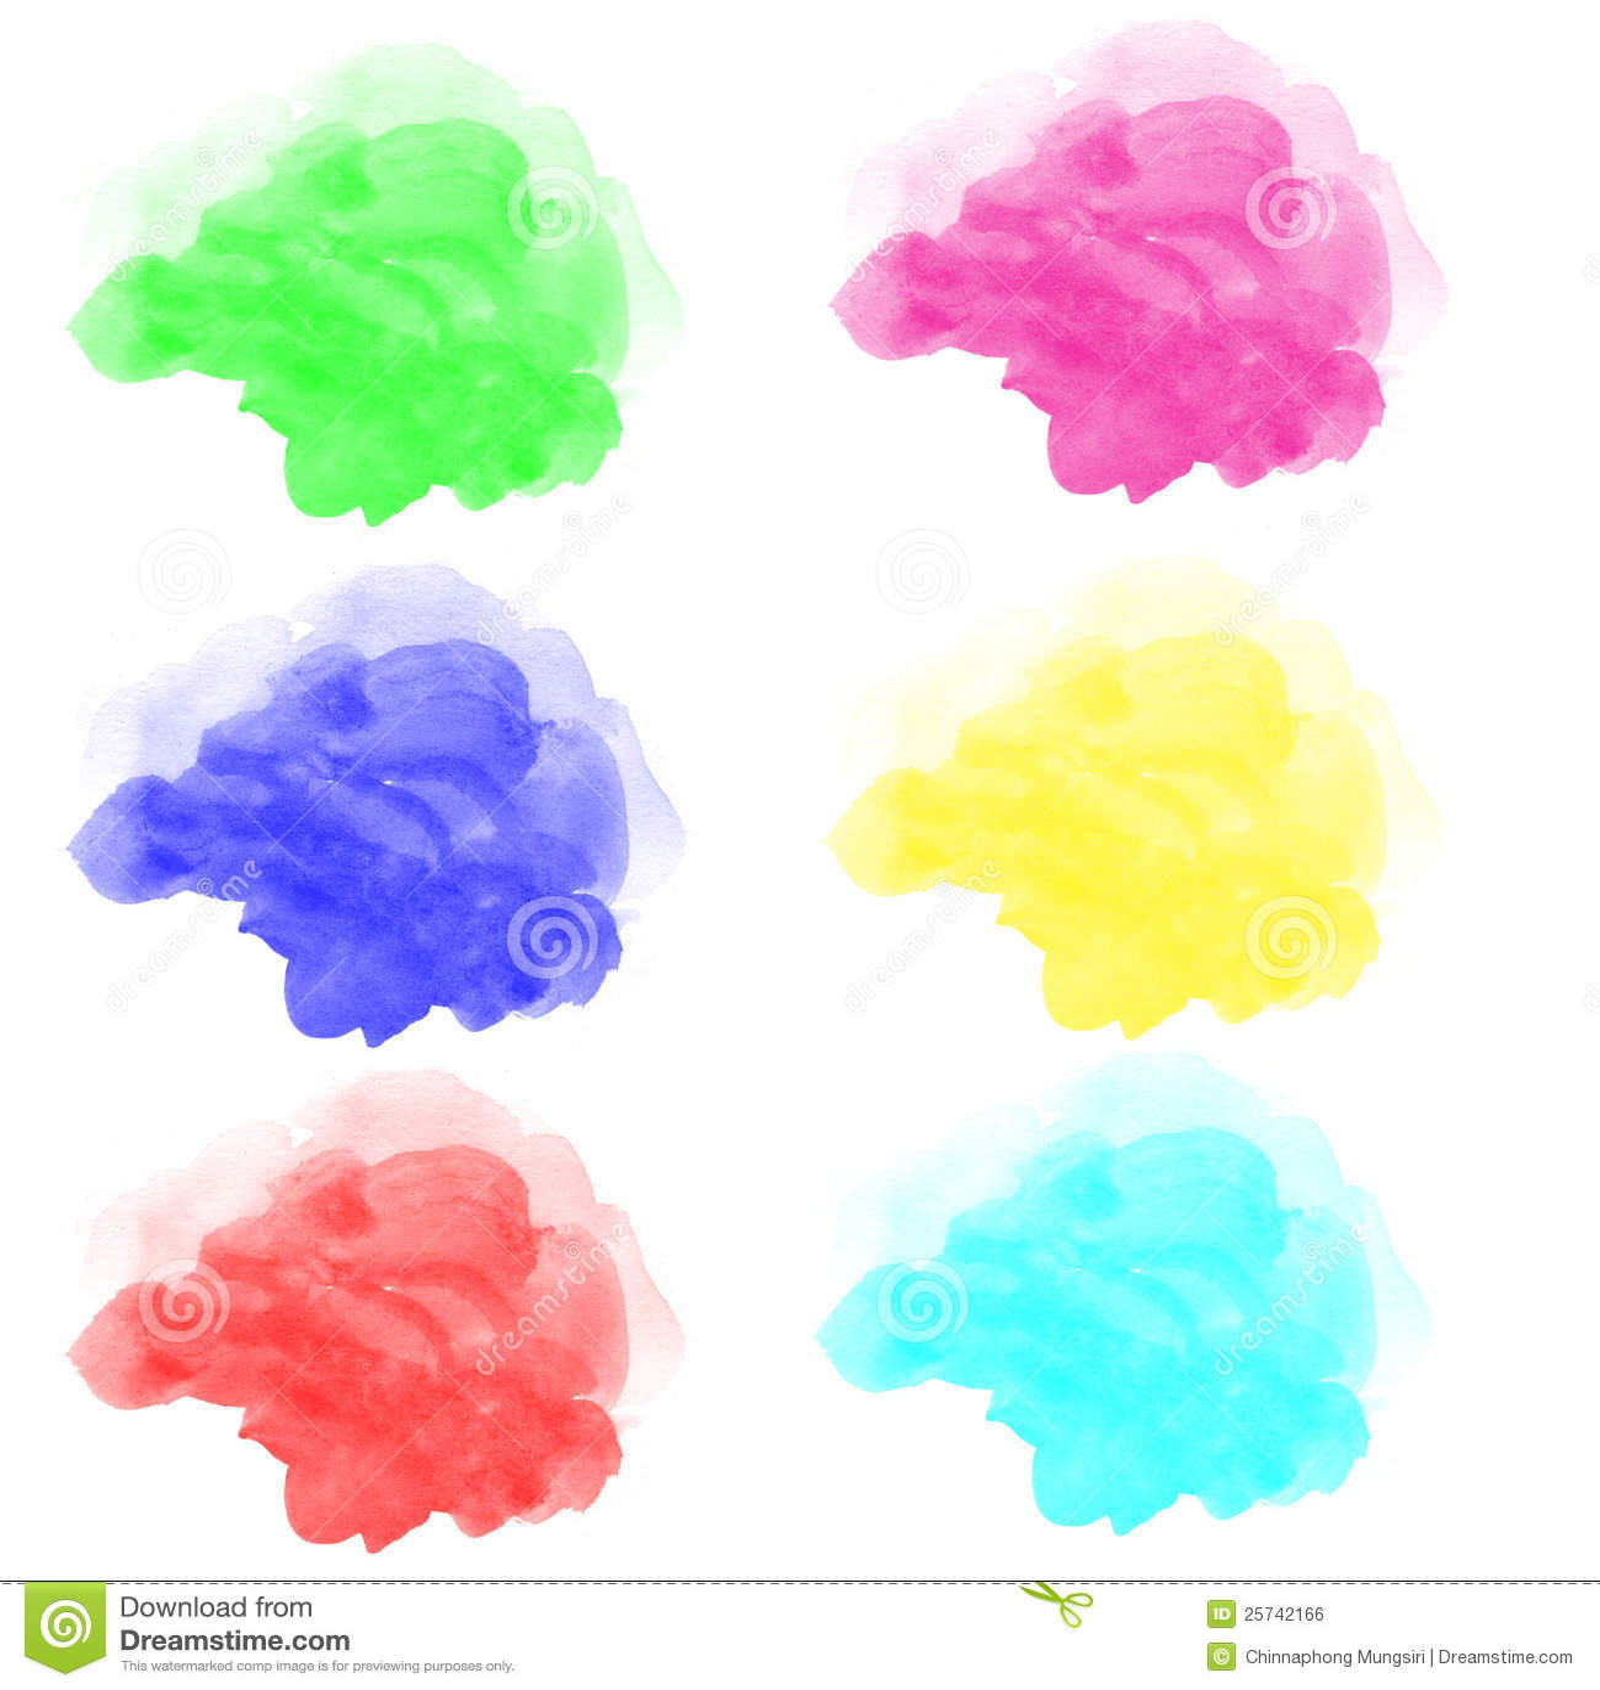 Abstract various watercolor